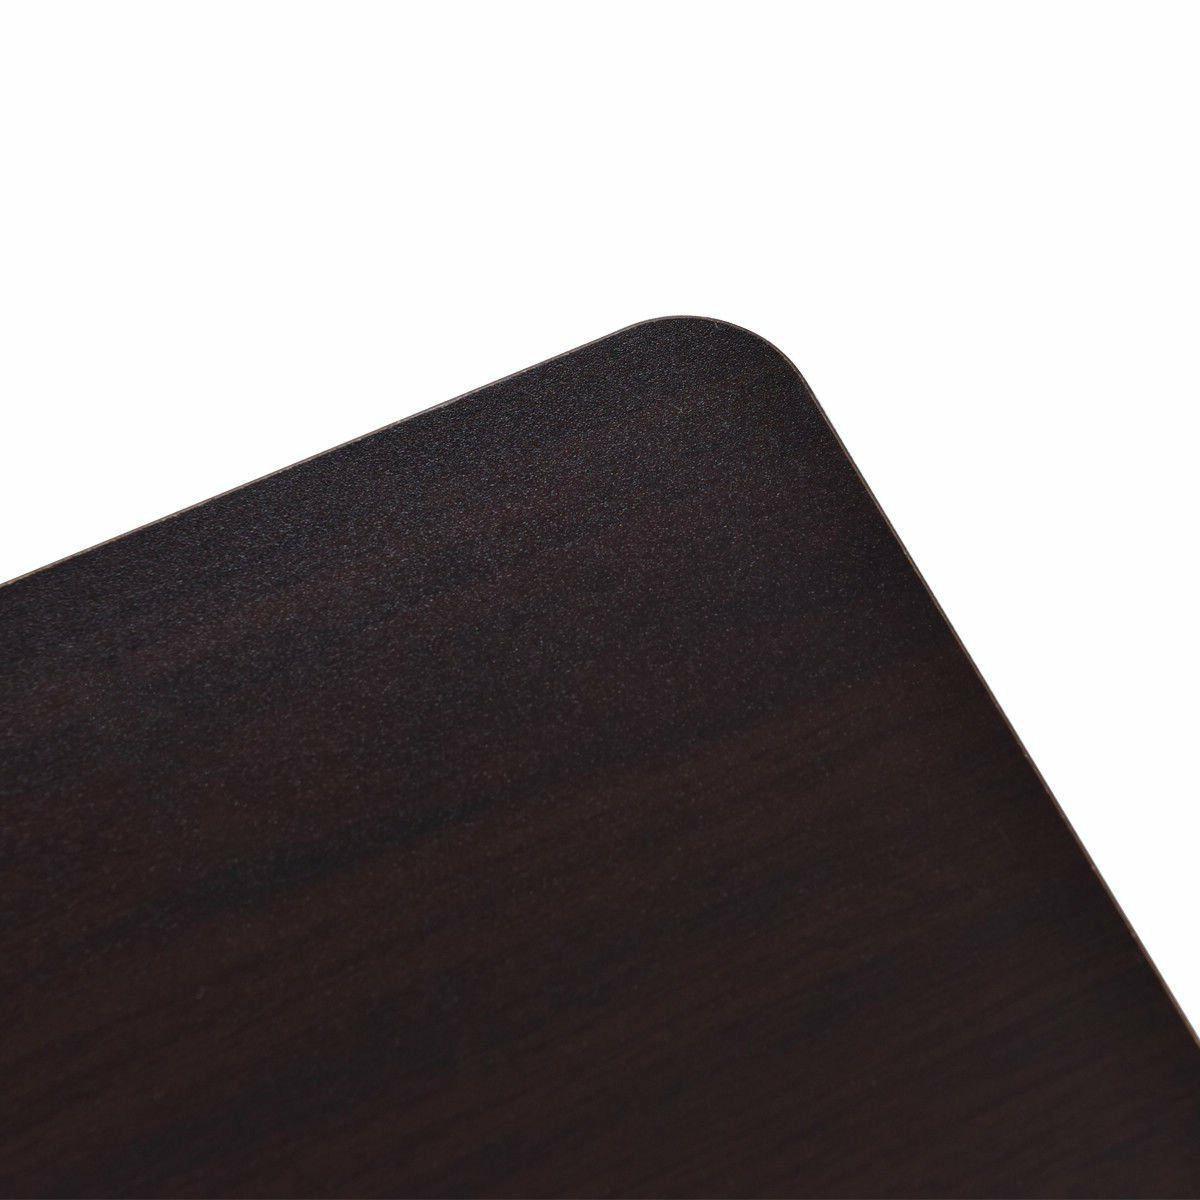 TANGKULA Portable Table TV Notebook Wood